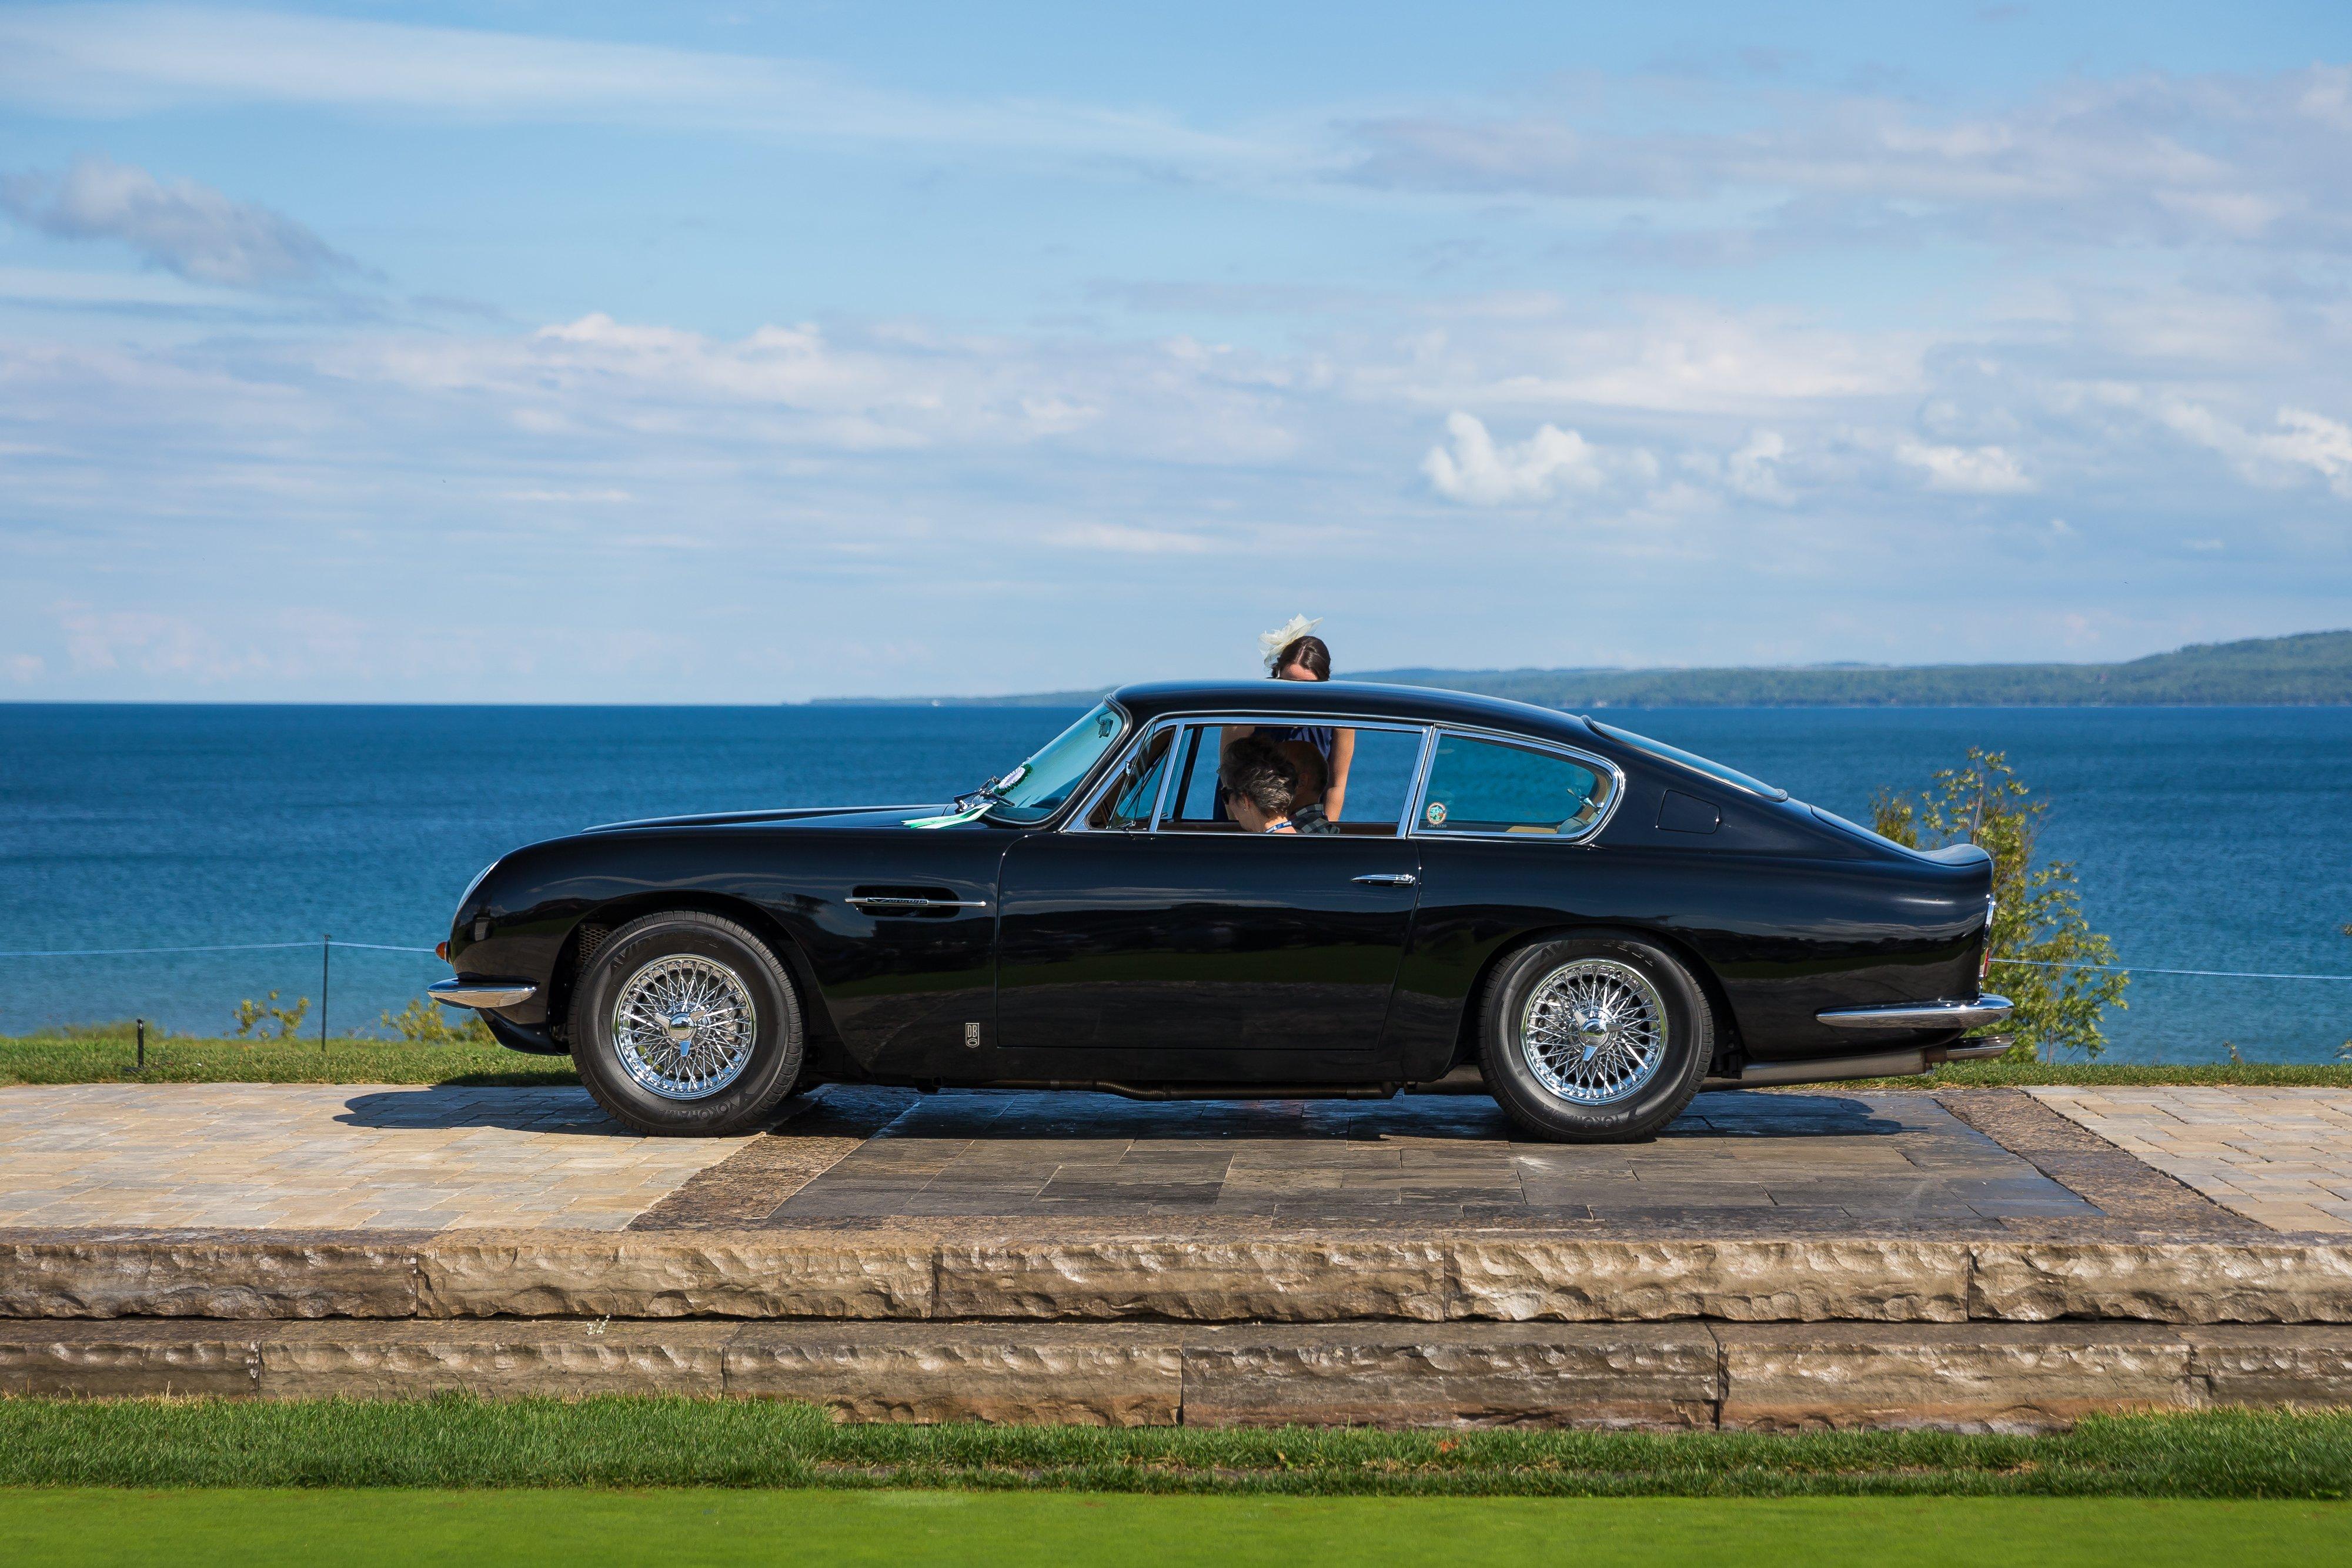 1966 Aston MArtin DB6 Vantage - 3rd